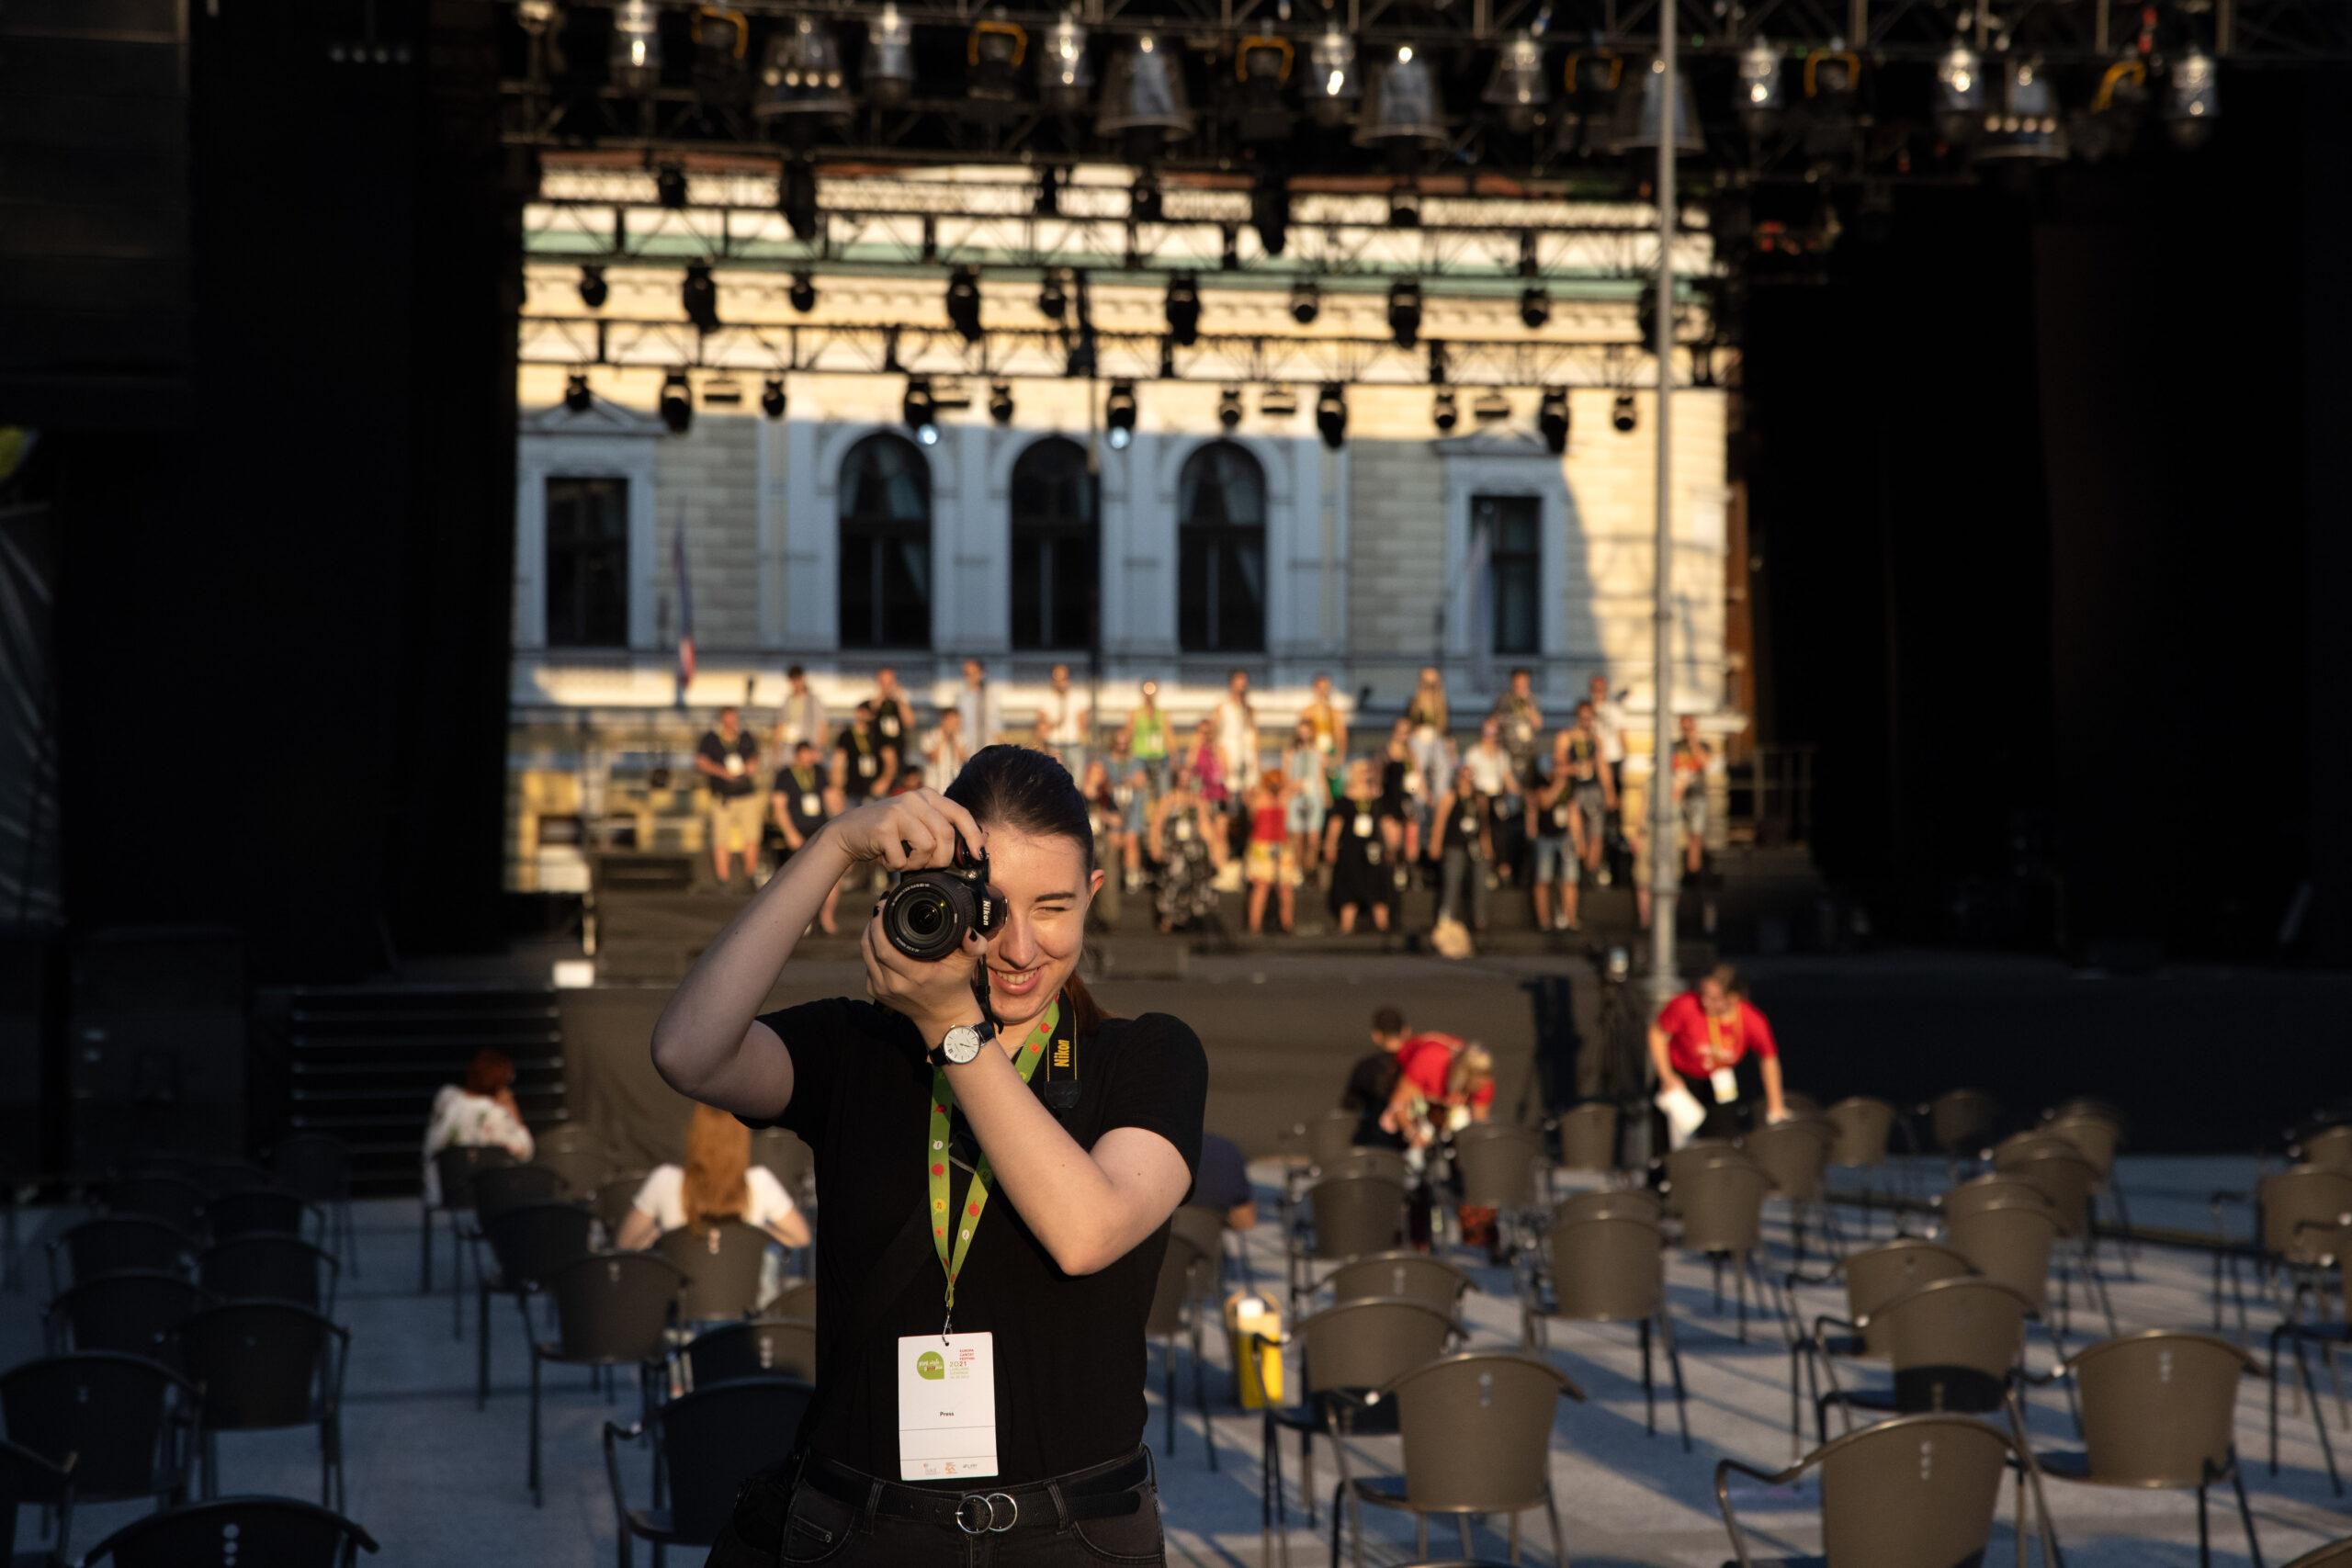 EC Ljubljana 2021, Perpetuum Jazzile; Photo: Tomaž Črnej